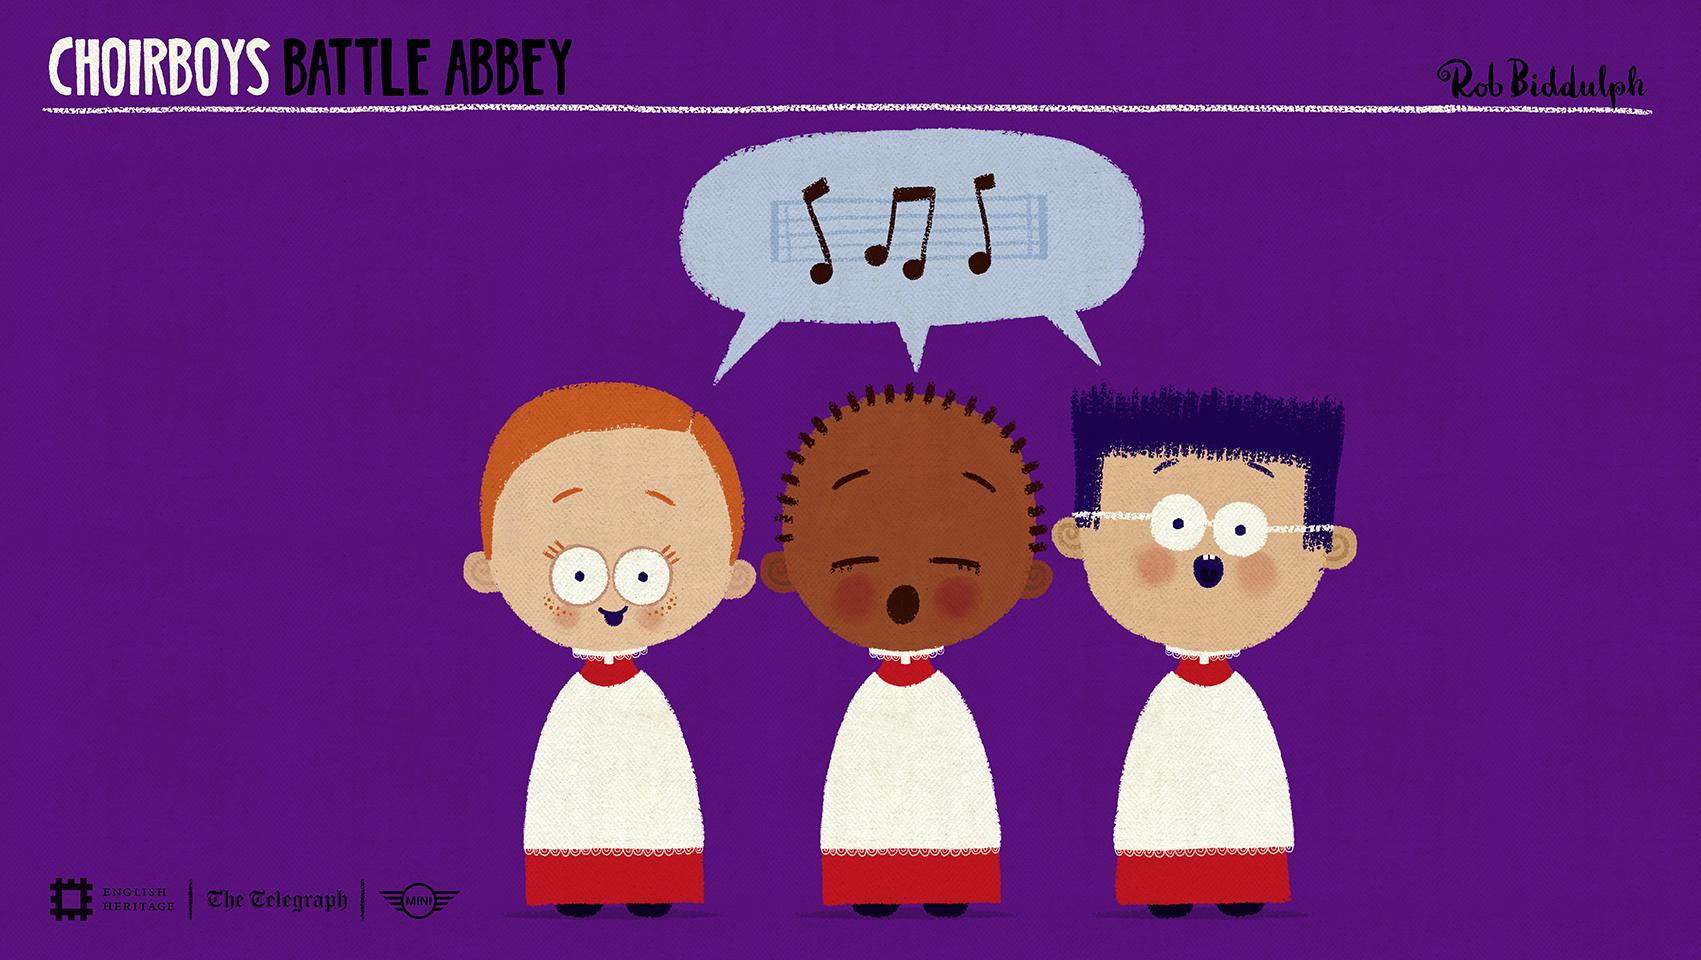 Choirboys.jpg